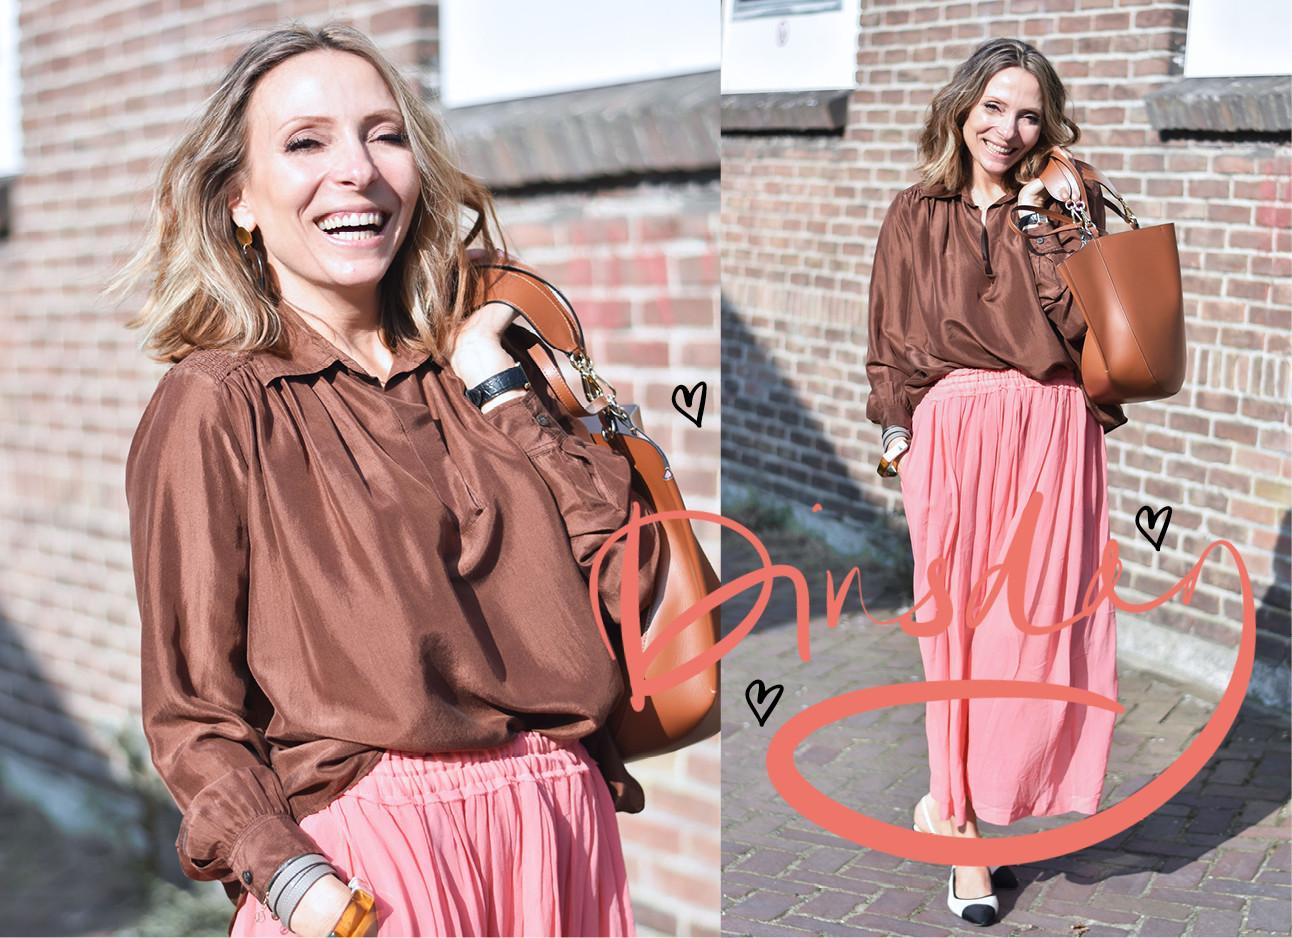 may-britt mobach in de look of the day, ze draagt een roze maxirok en bruine blouse